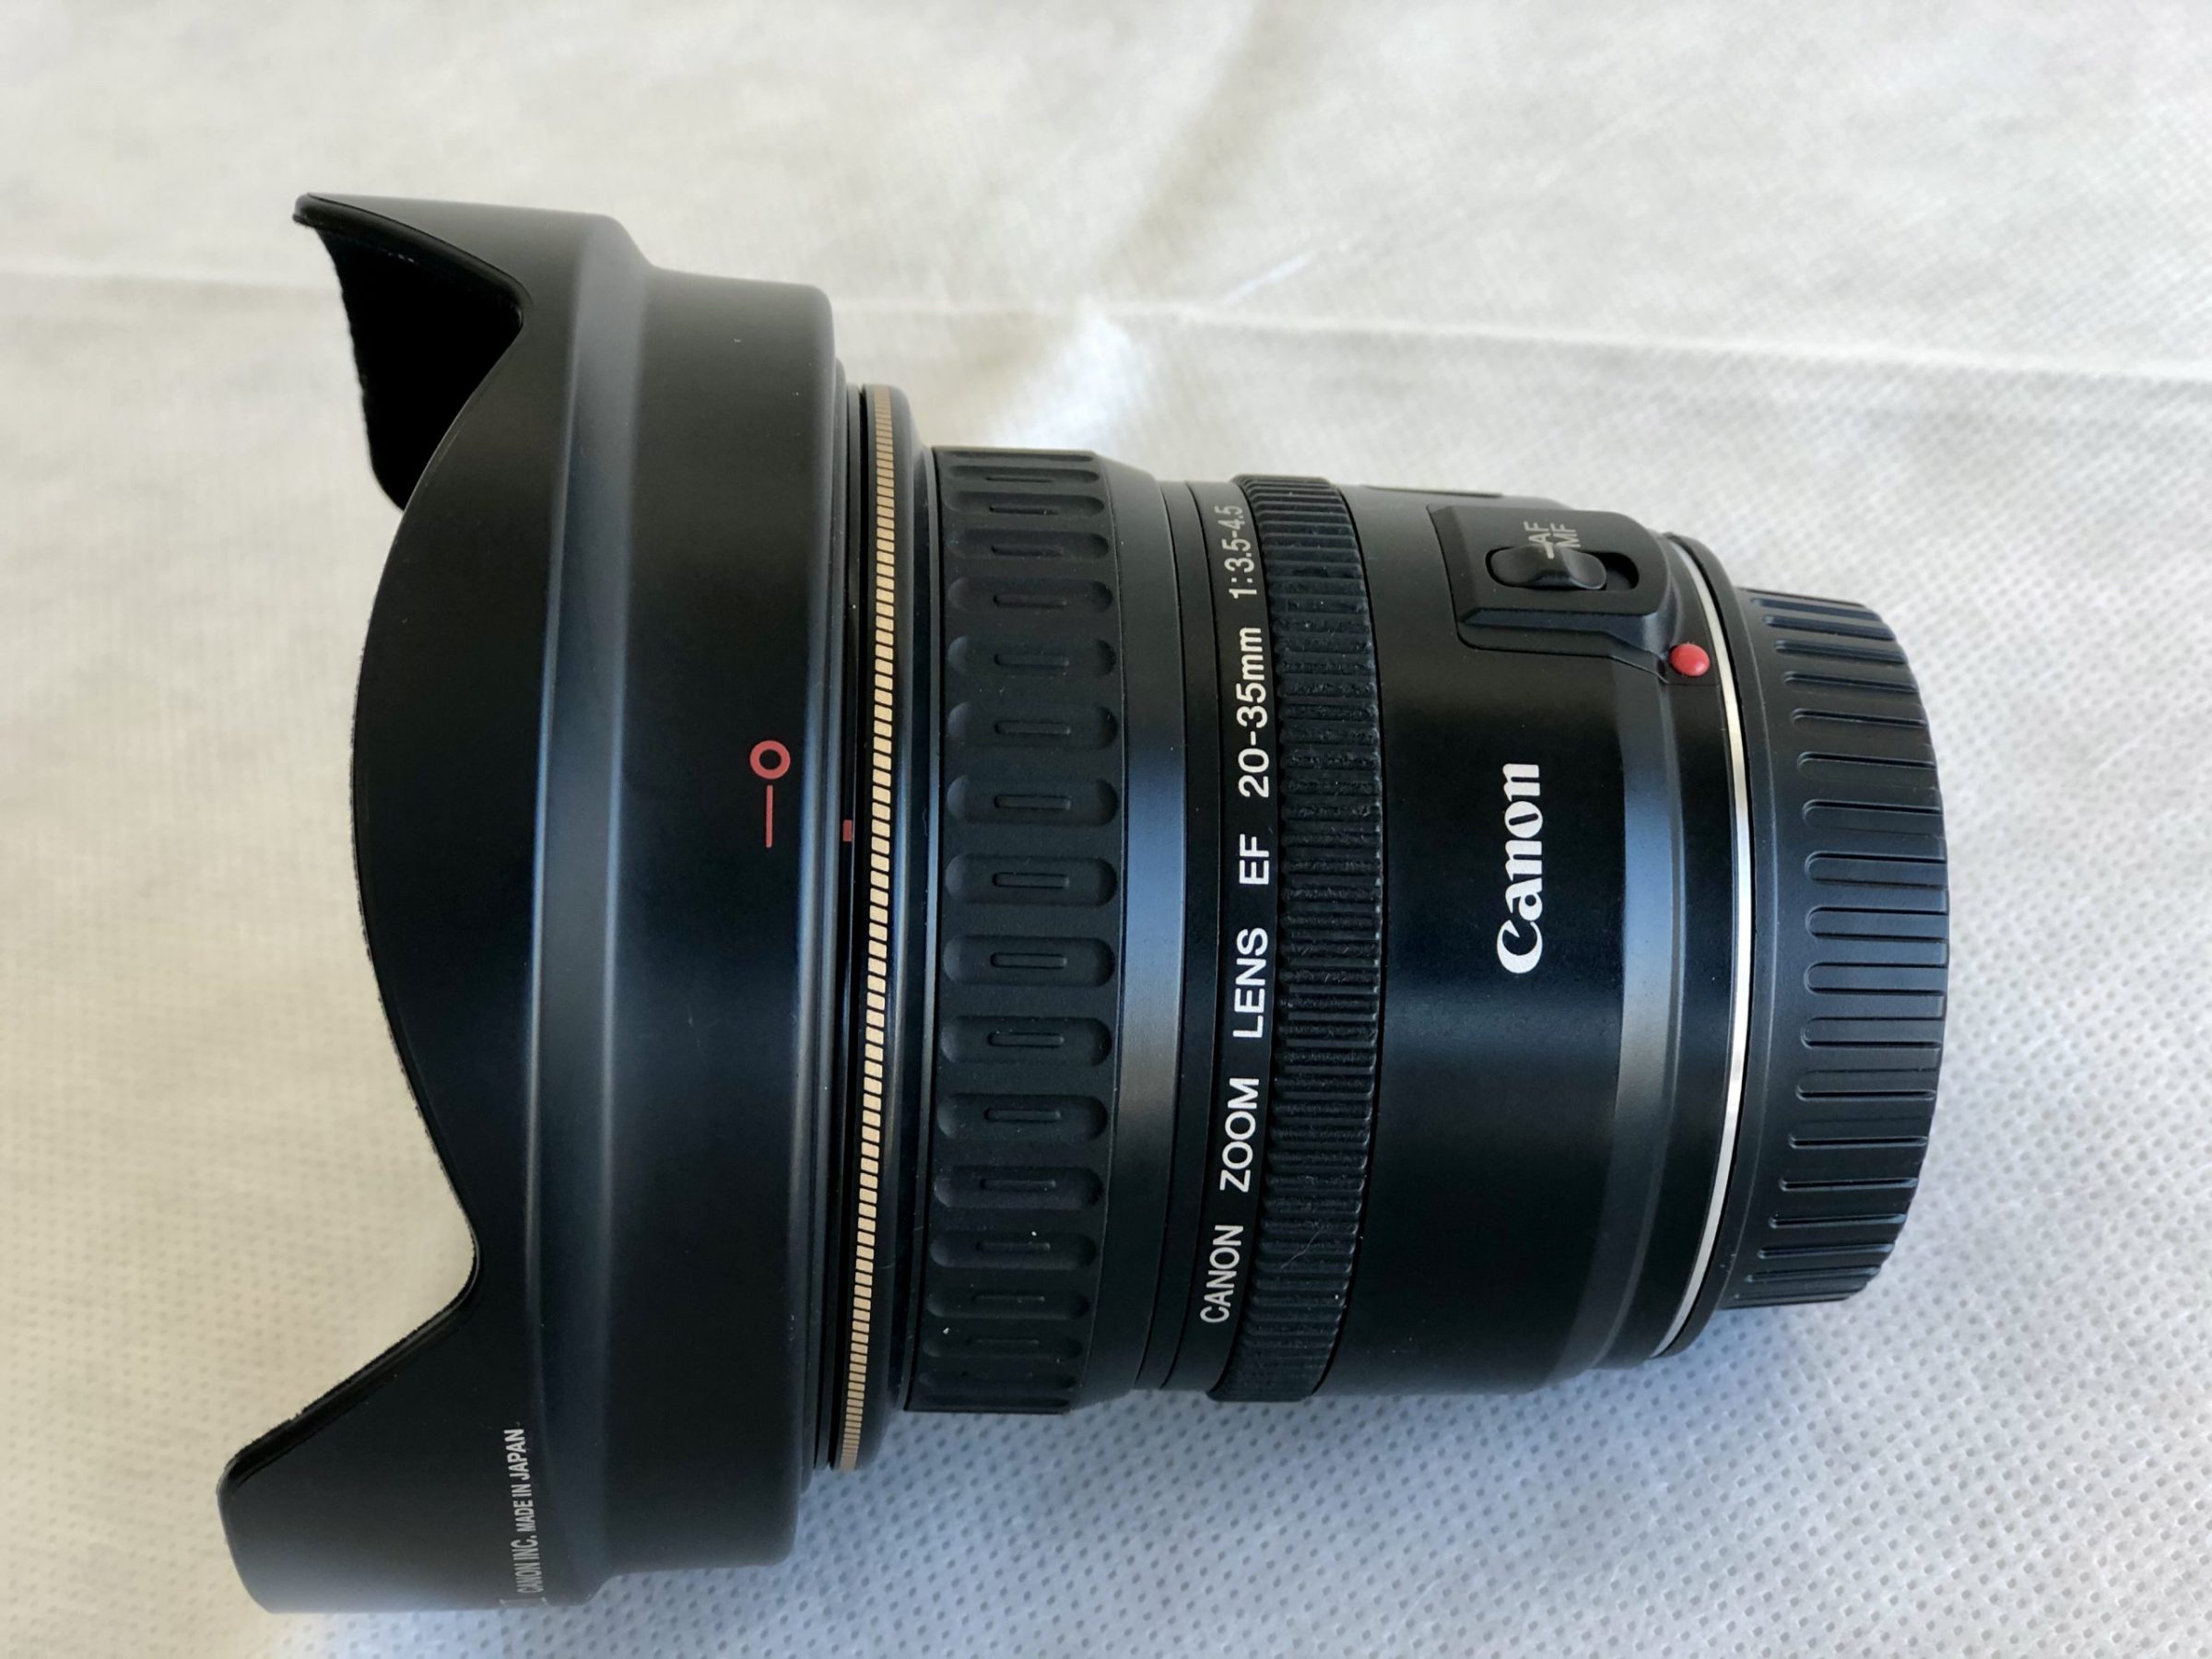 Canon Zoom Super Wide Angle EF 20-35mm f/3.5-4.5 USM Autofocus Lens